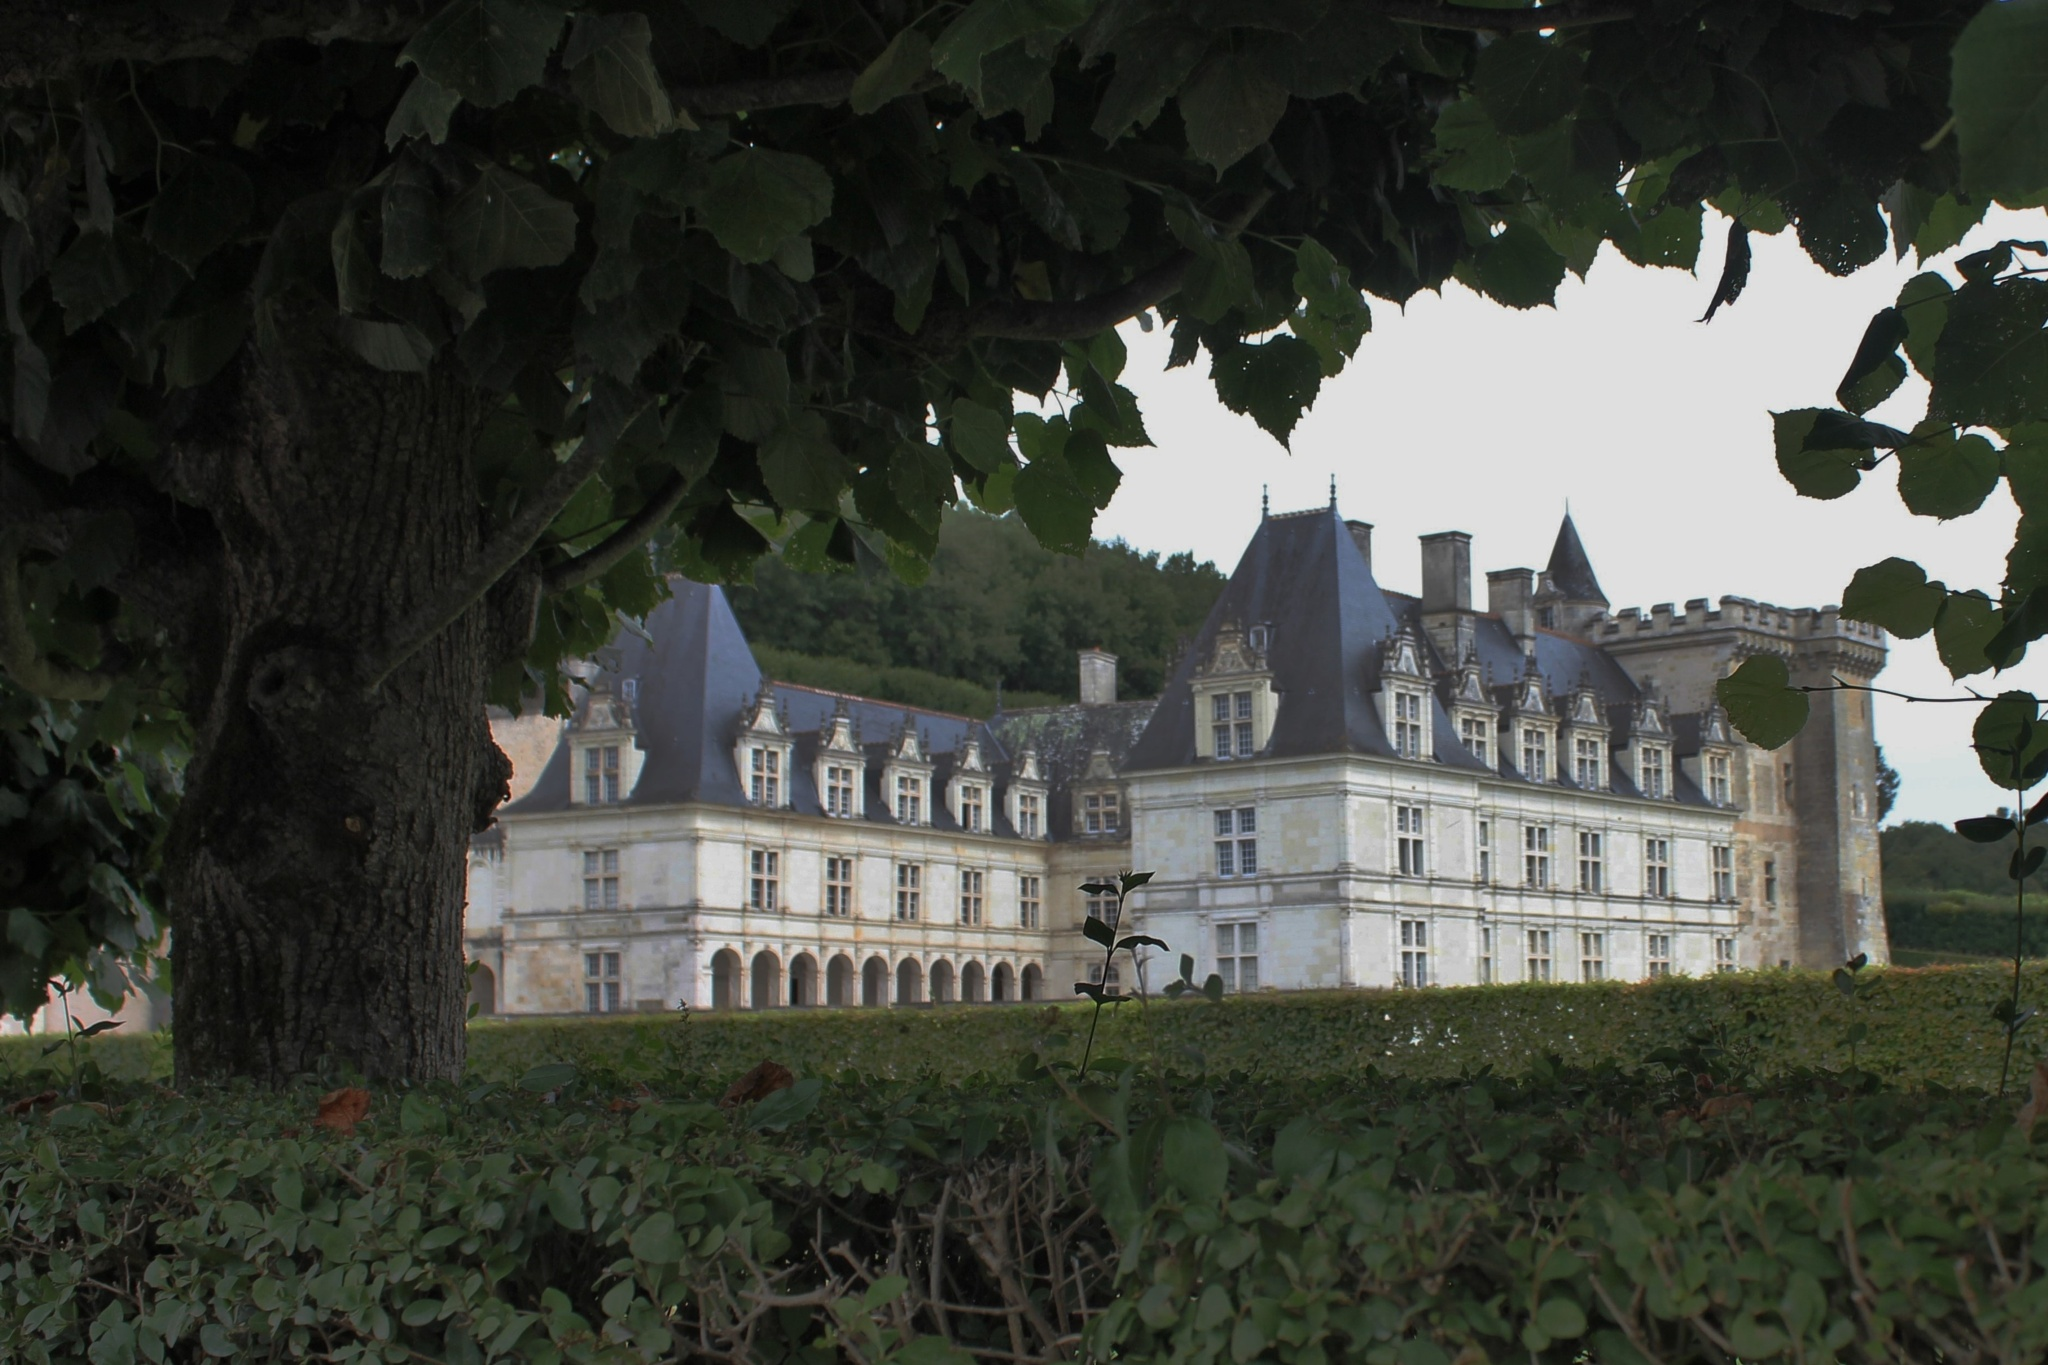 Chateau Vilandry by colin.savidge